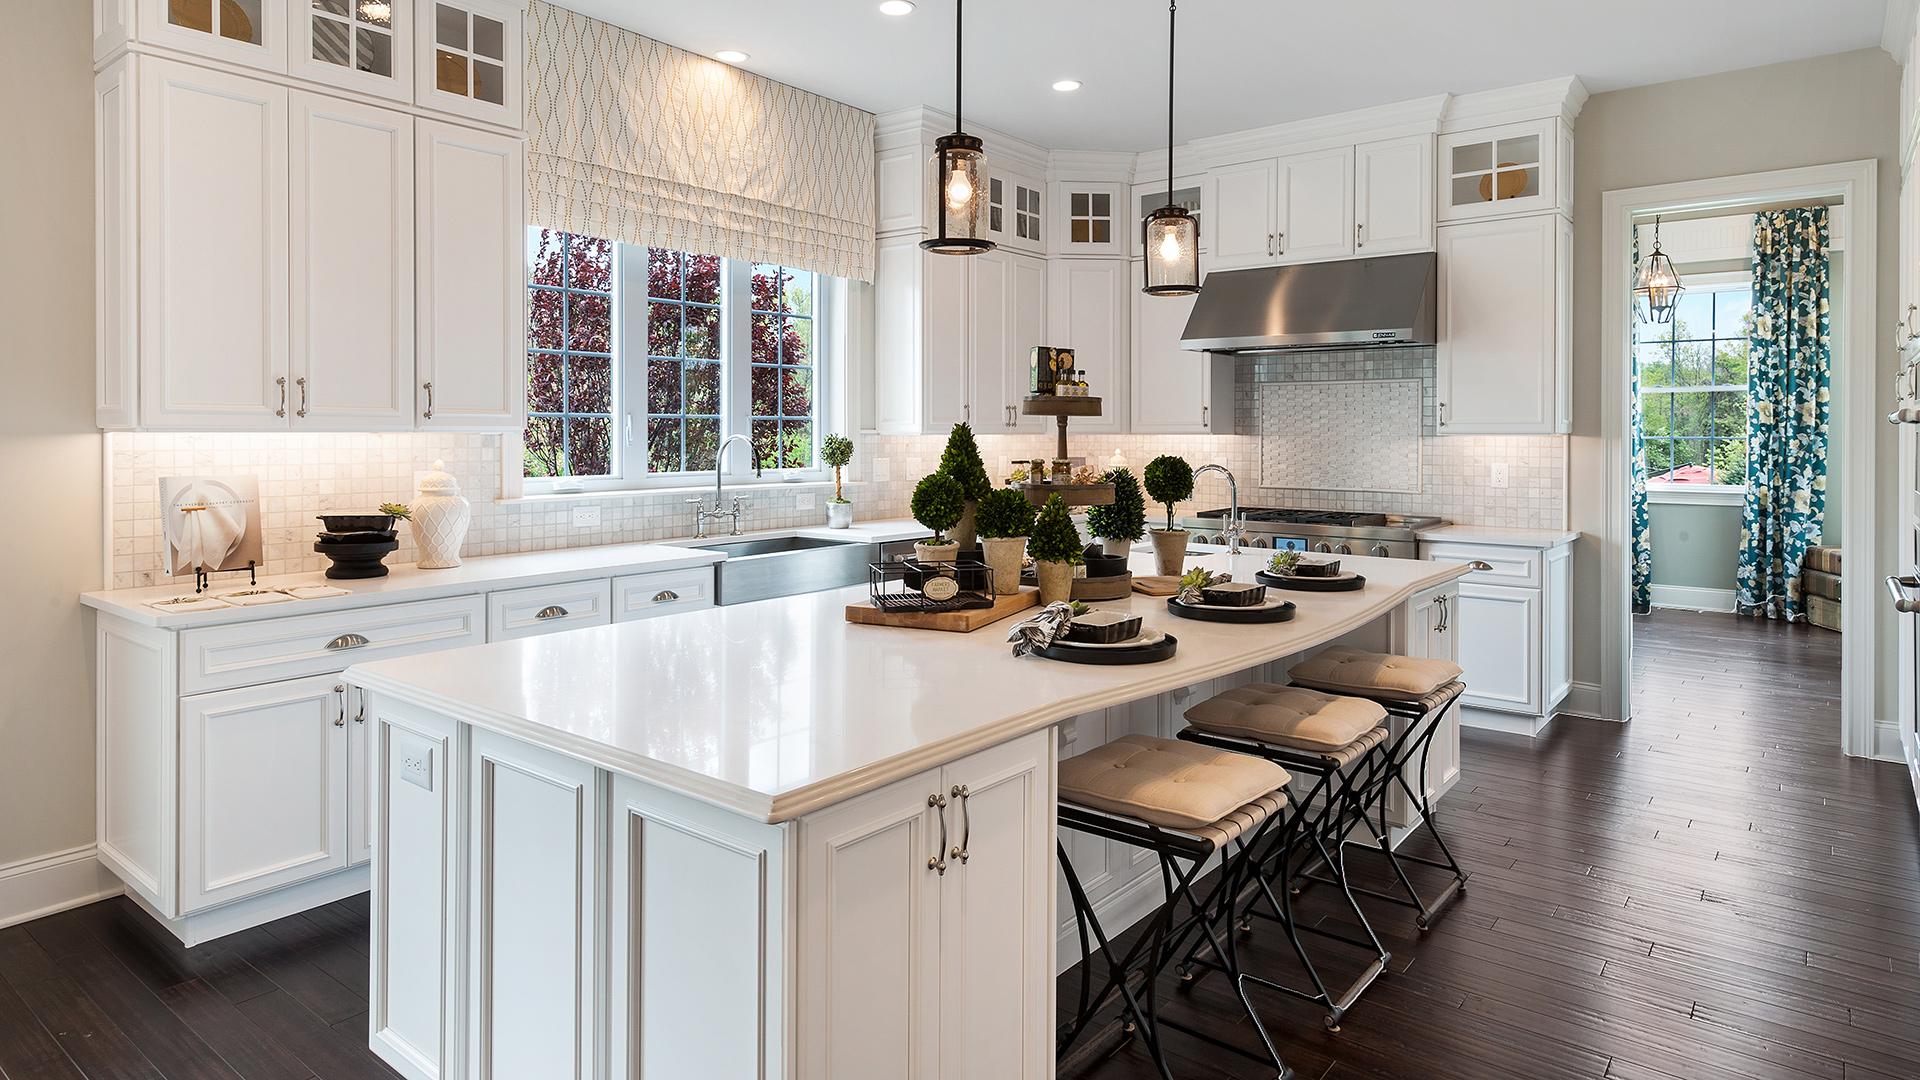 Henley Kitchen. Lincroft NJ New Homes for Sale   Estates at Bamm Hollow